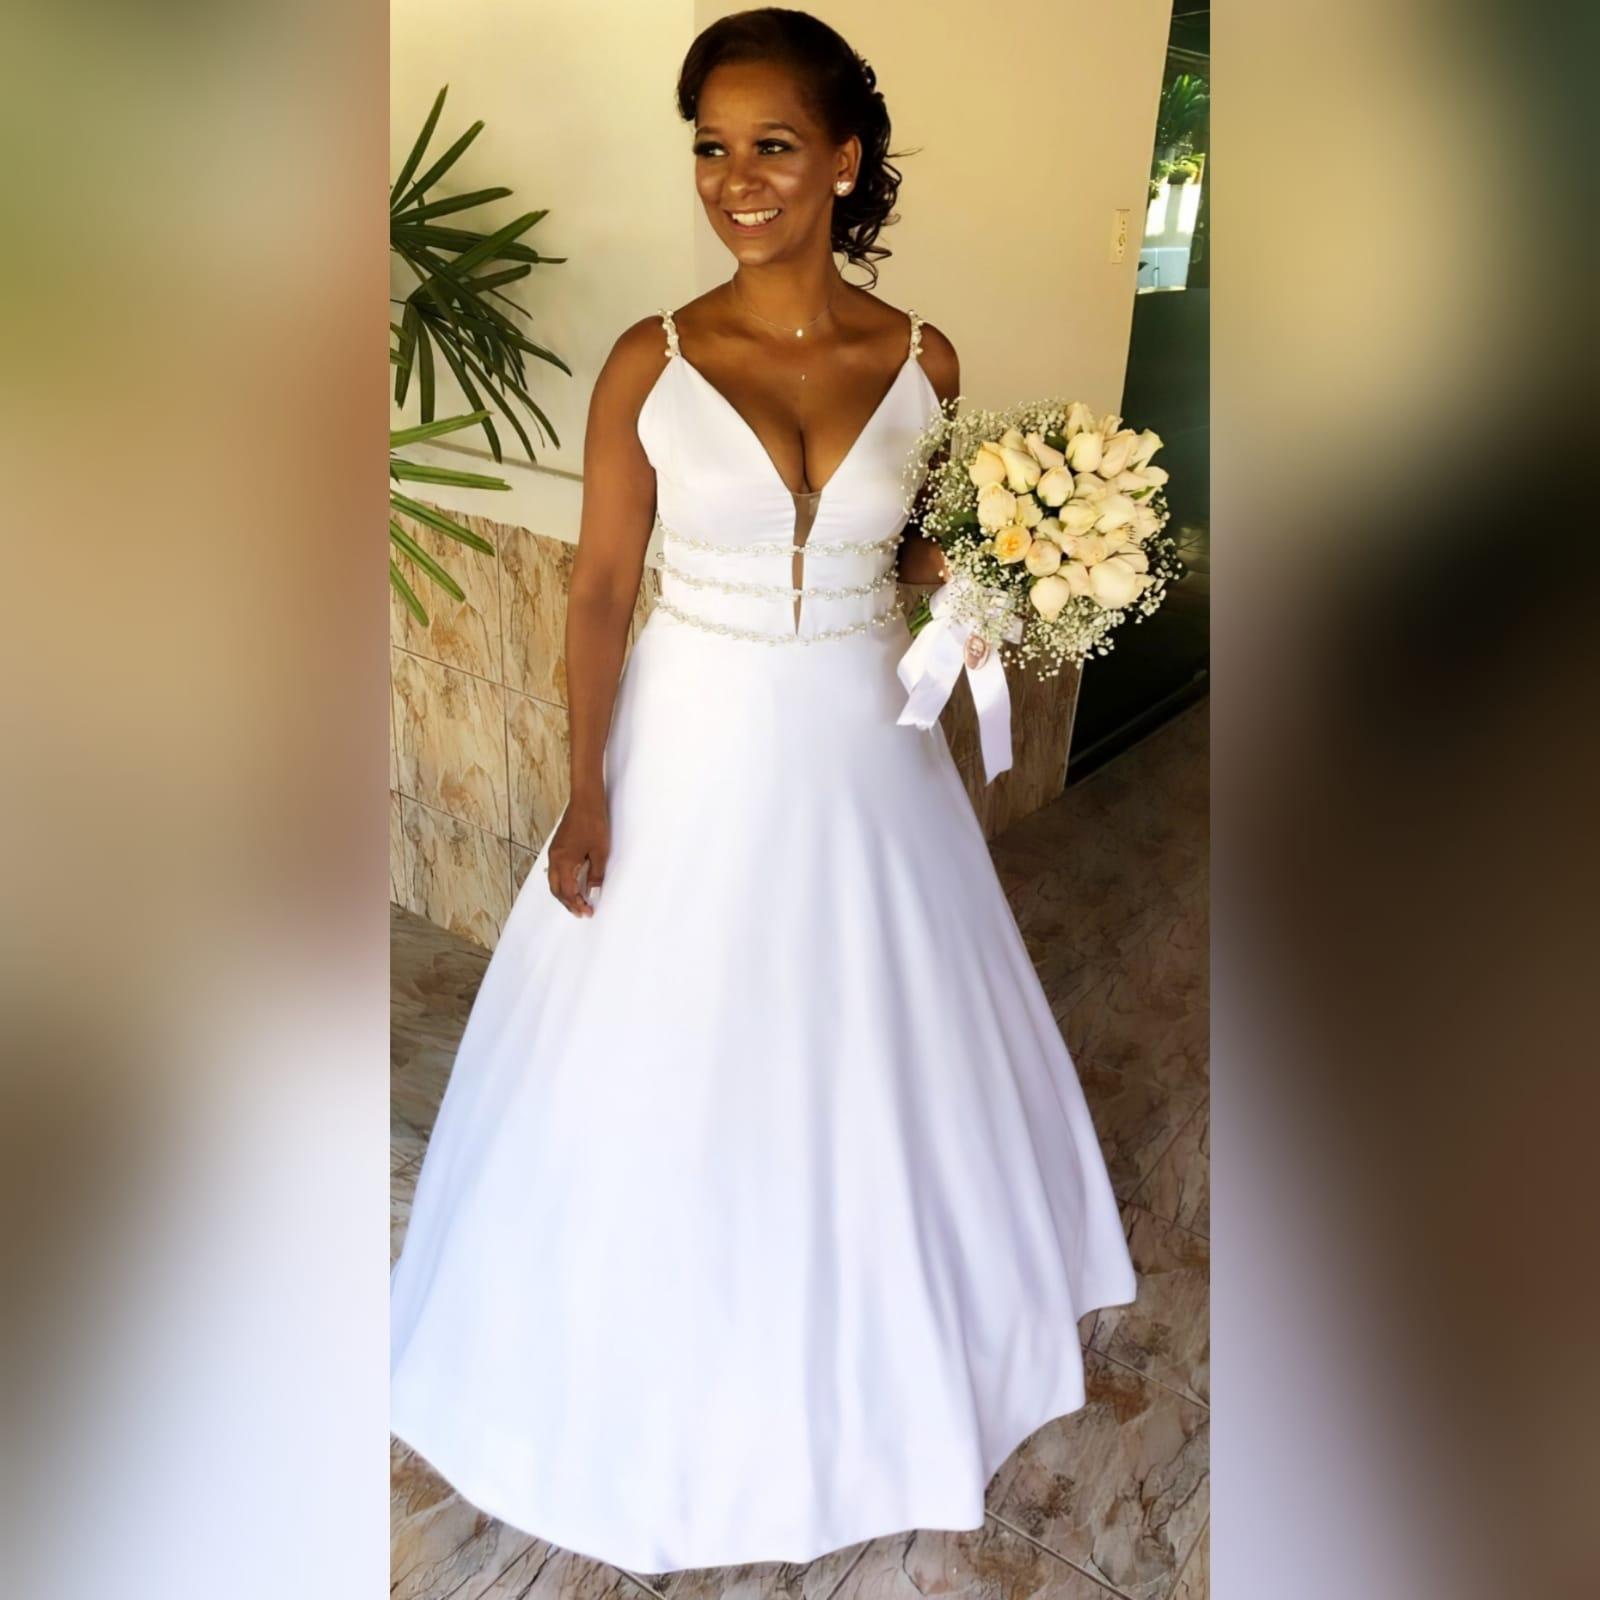 Wedding dresses info 5